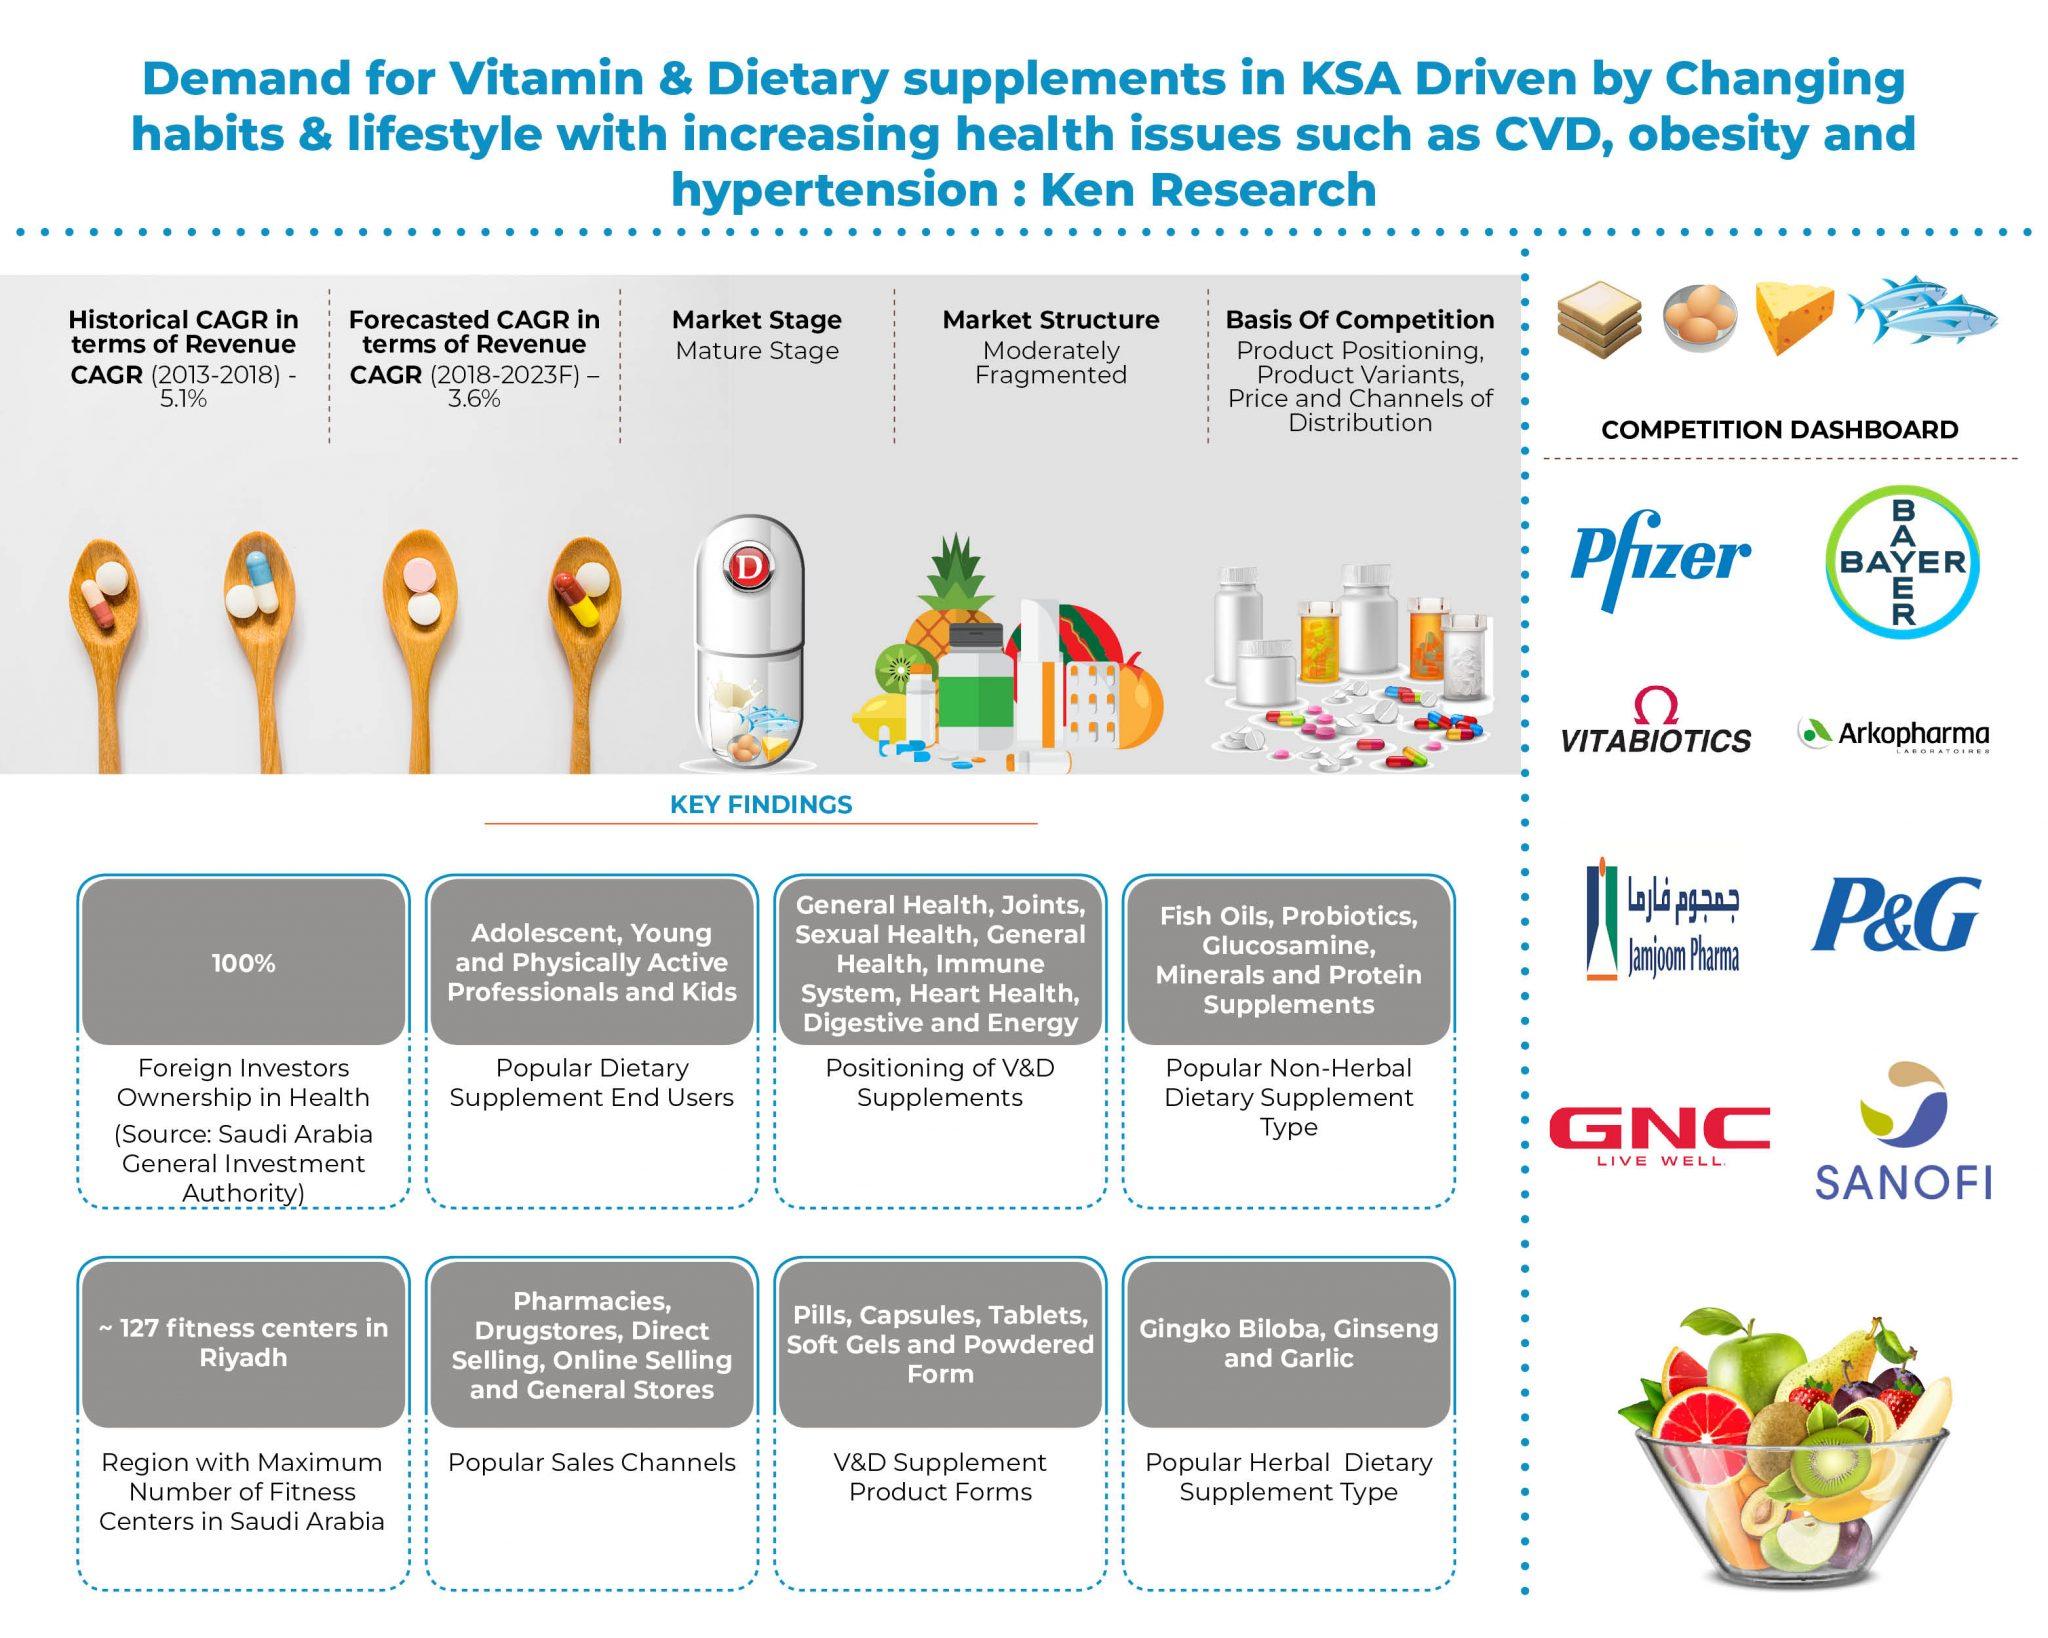 saudi-arabia-vitamins-and-dietary-supplements-market